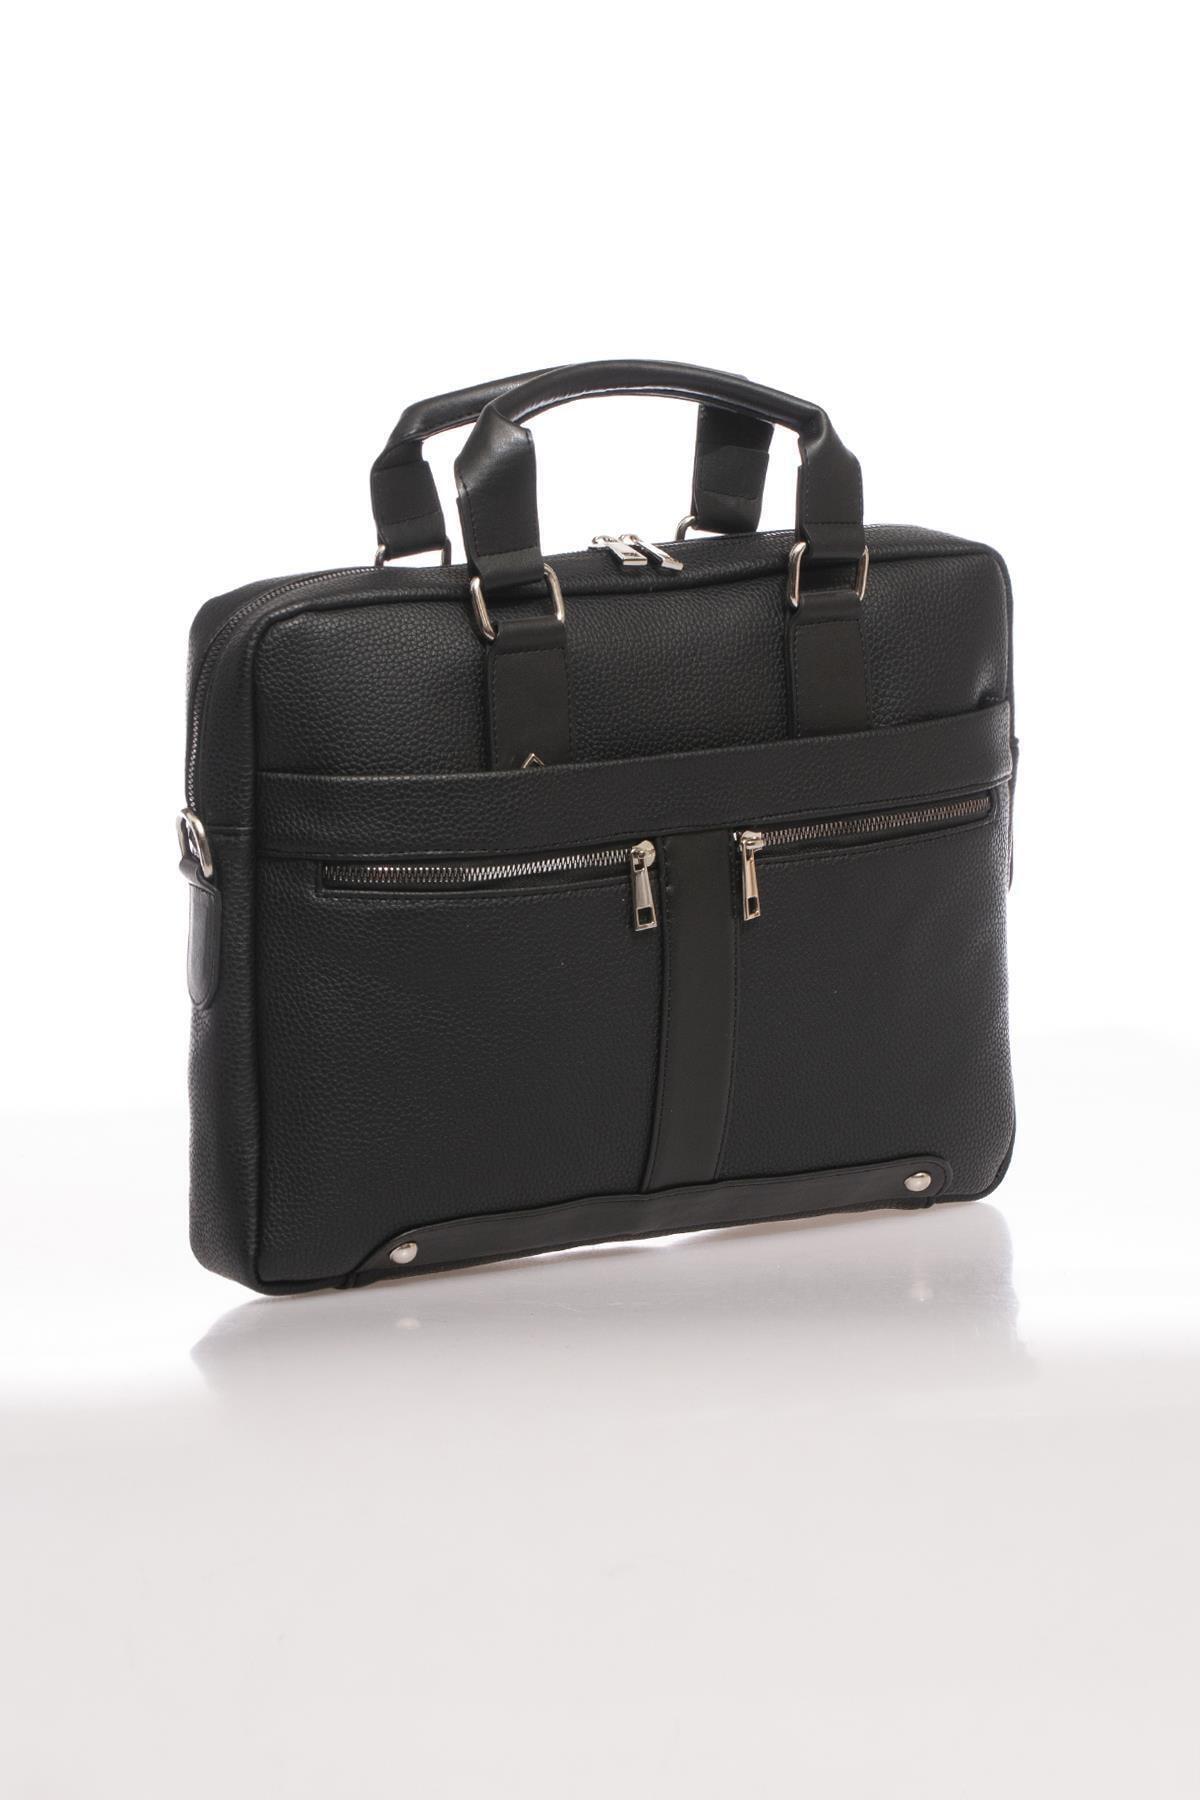 Sergio Giorgianni Luxury Mpist9141 Belinda Siyah Unısex Evrak Çantası 2